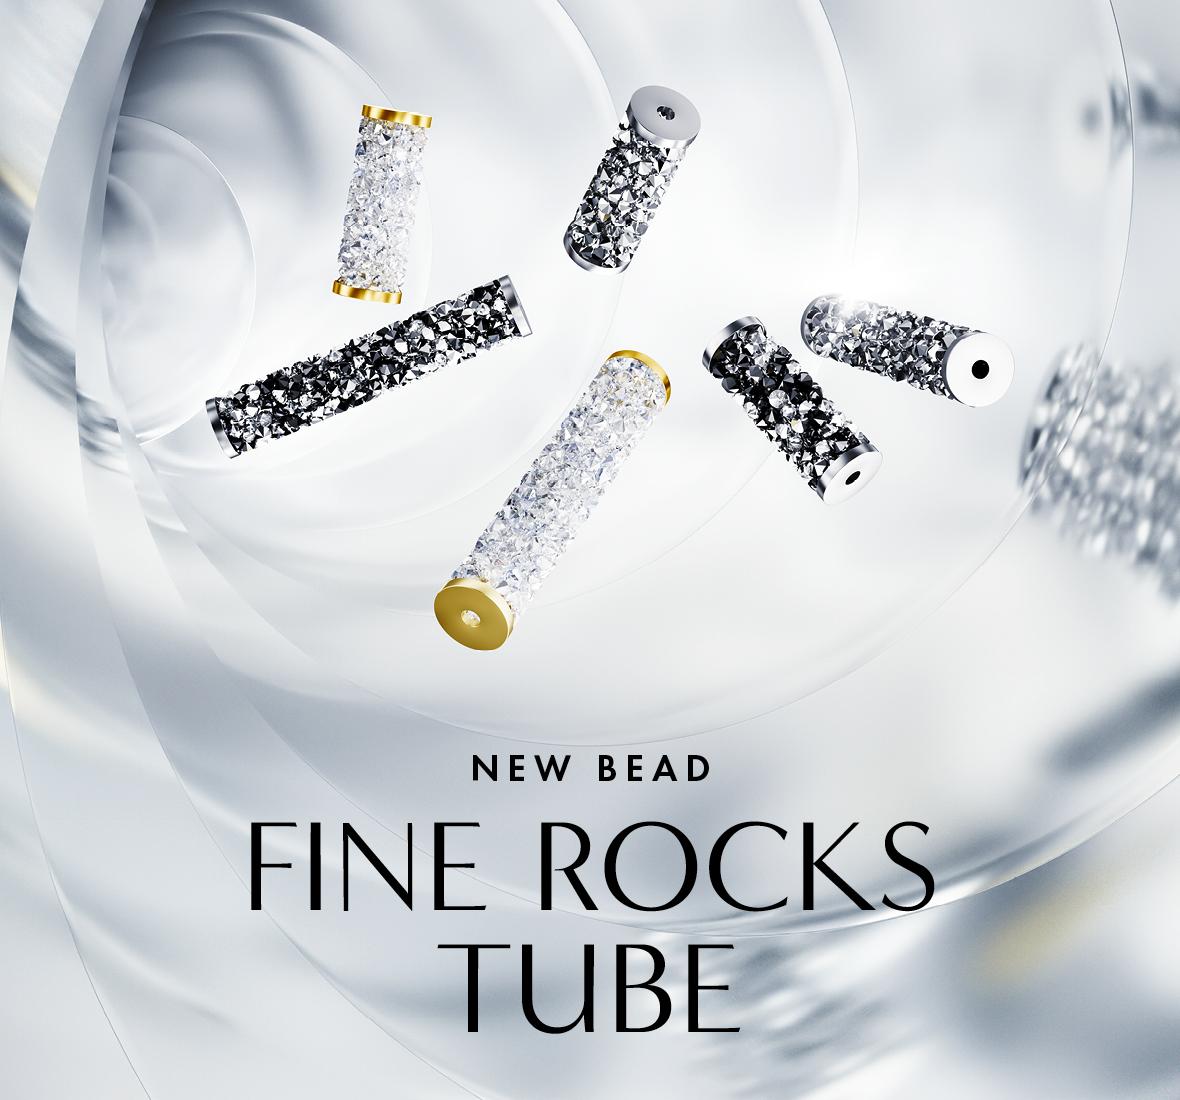 New Swarovski Crystal Fine Rocks Tube Beads Innovations